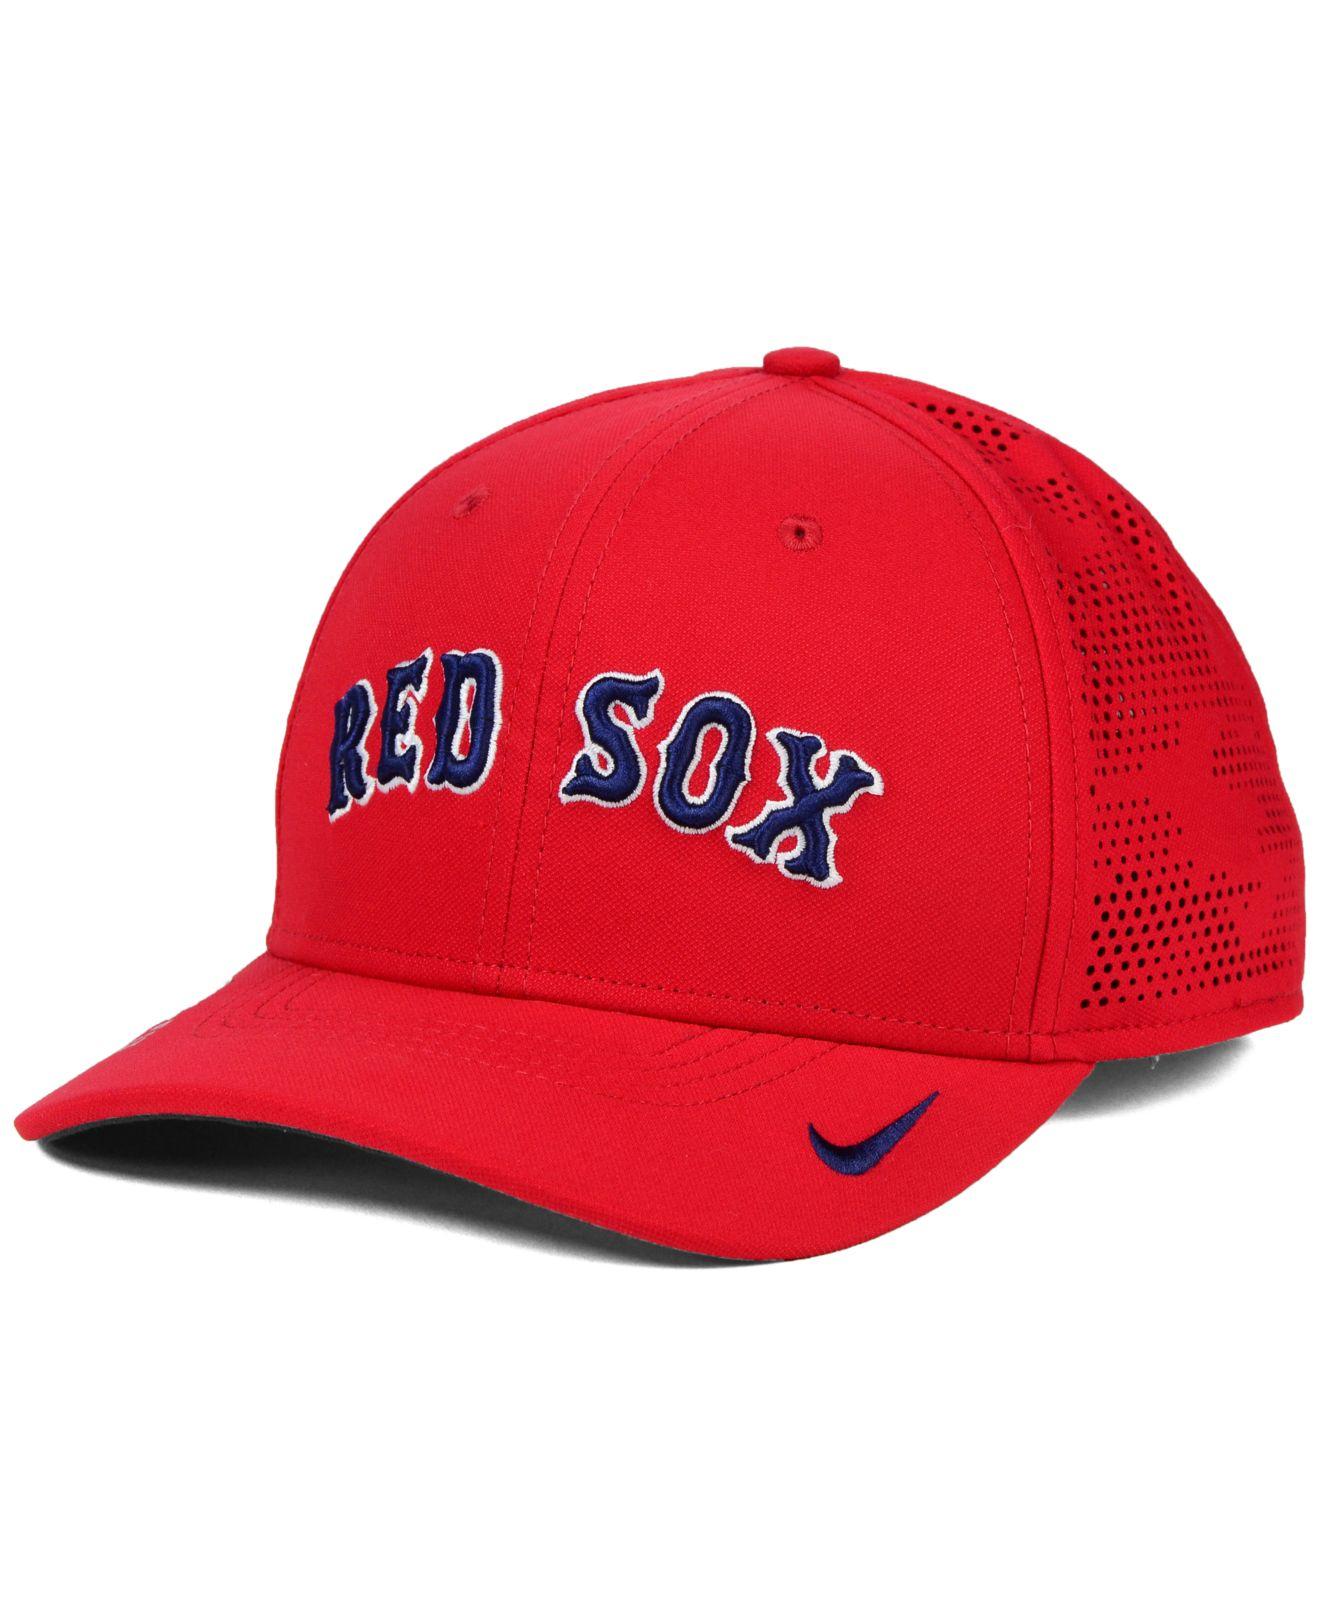 2eacb3edb3c Lyst - Nike Boston Red Sox Dri-fit Vapor Classic Swoosh Flex Cap in ...